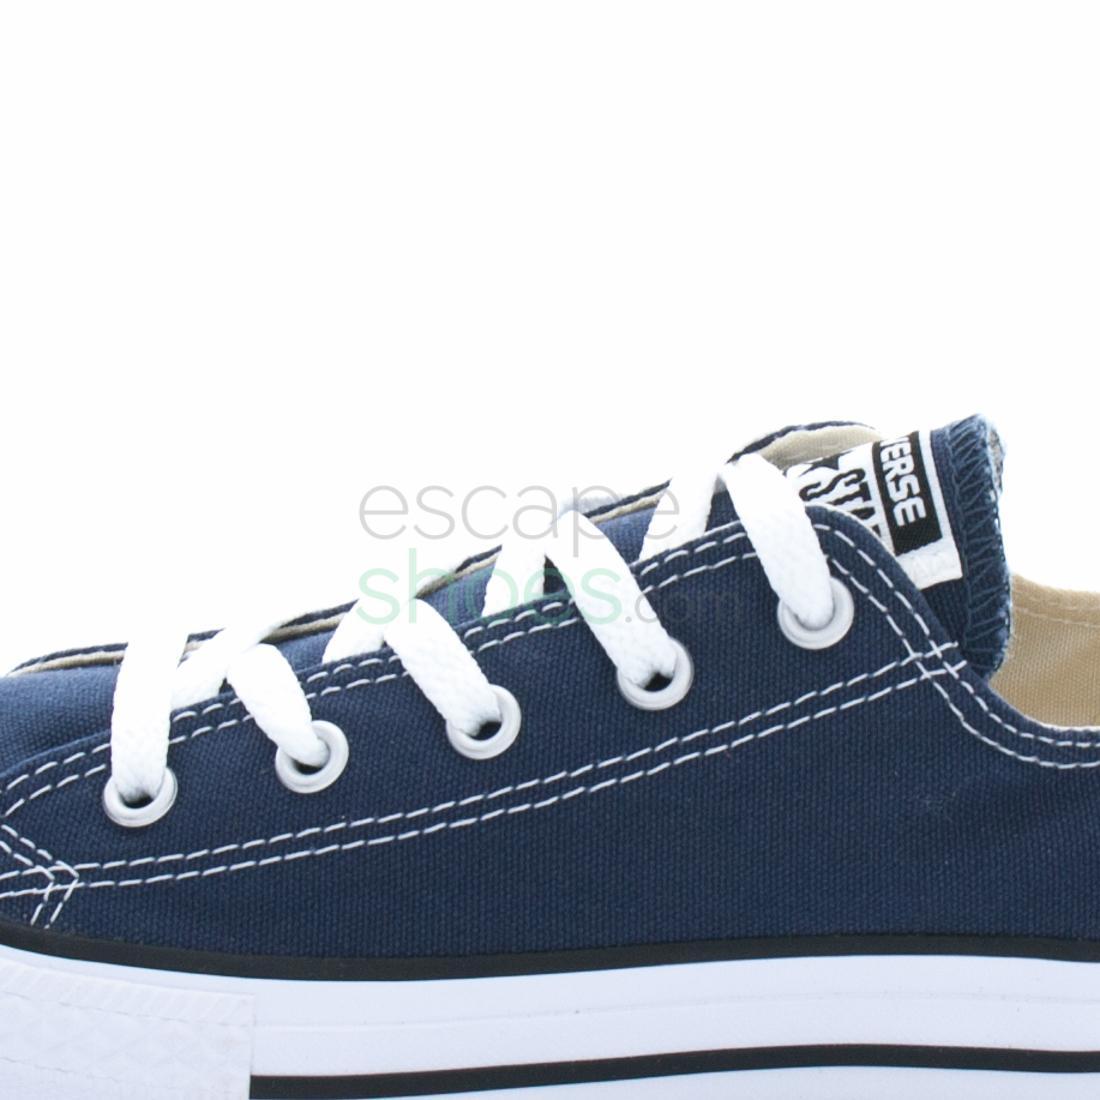 Converse Chucks Kinder 3J237C AS OX Blau Navy